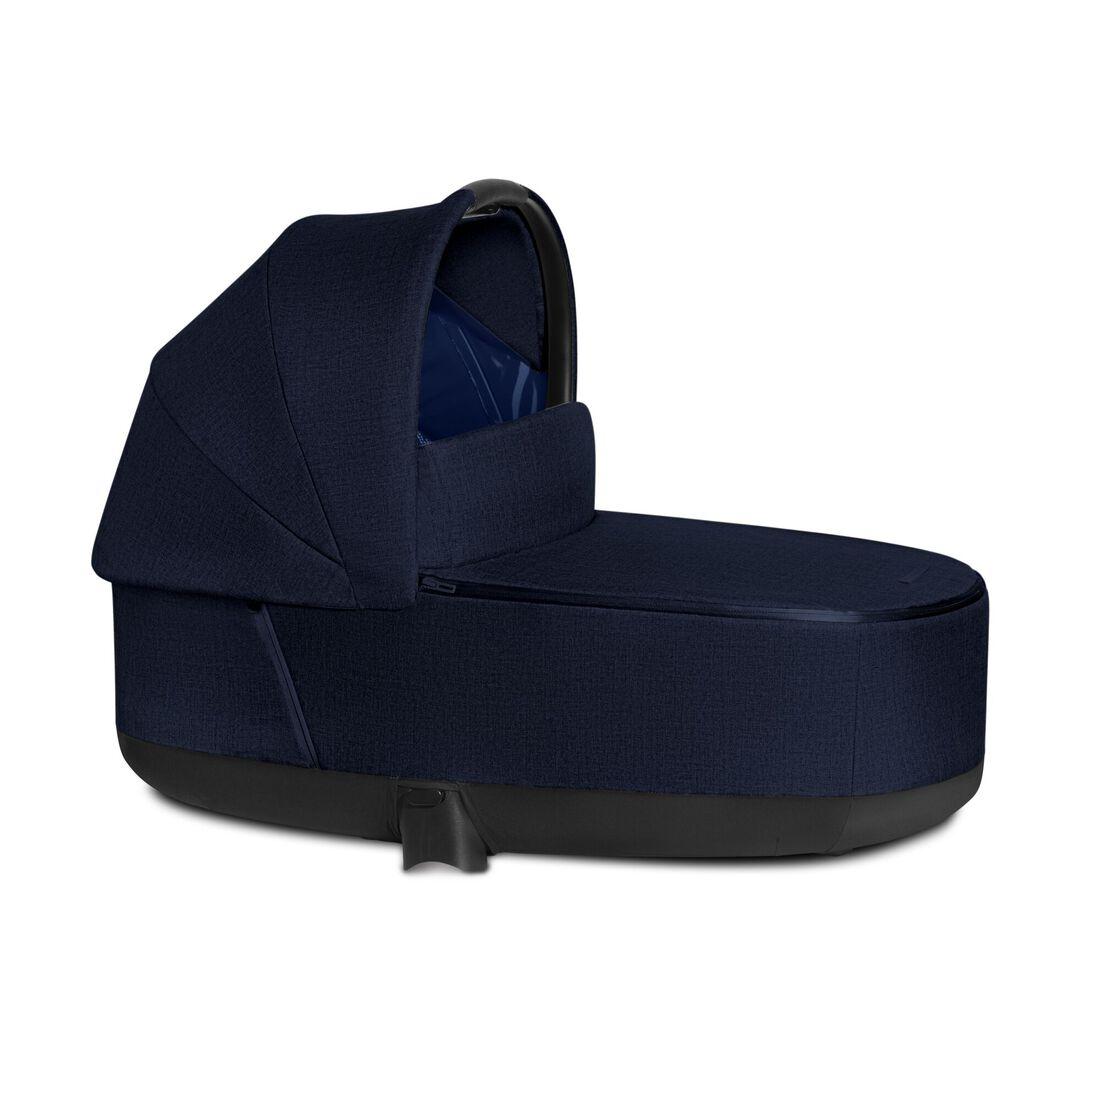 CYBEX Priam Lux Carry Cot - Midnight Blue Plus in Midnight Blue Plus large Bild 1